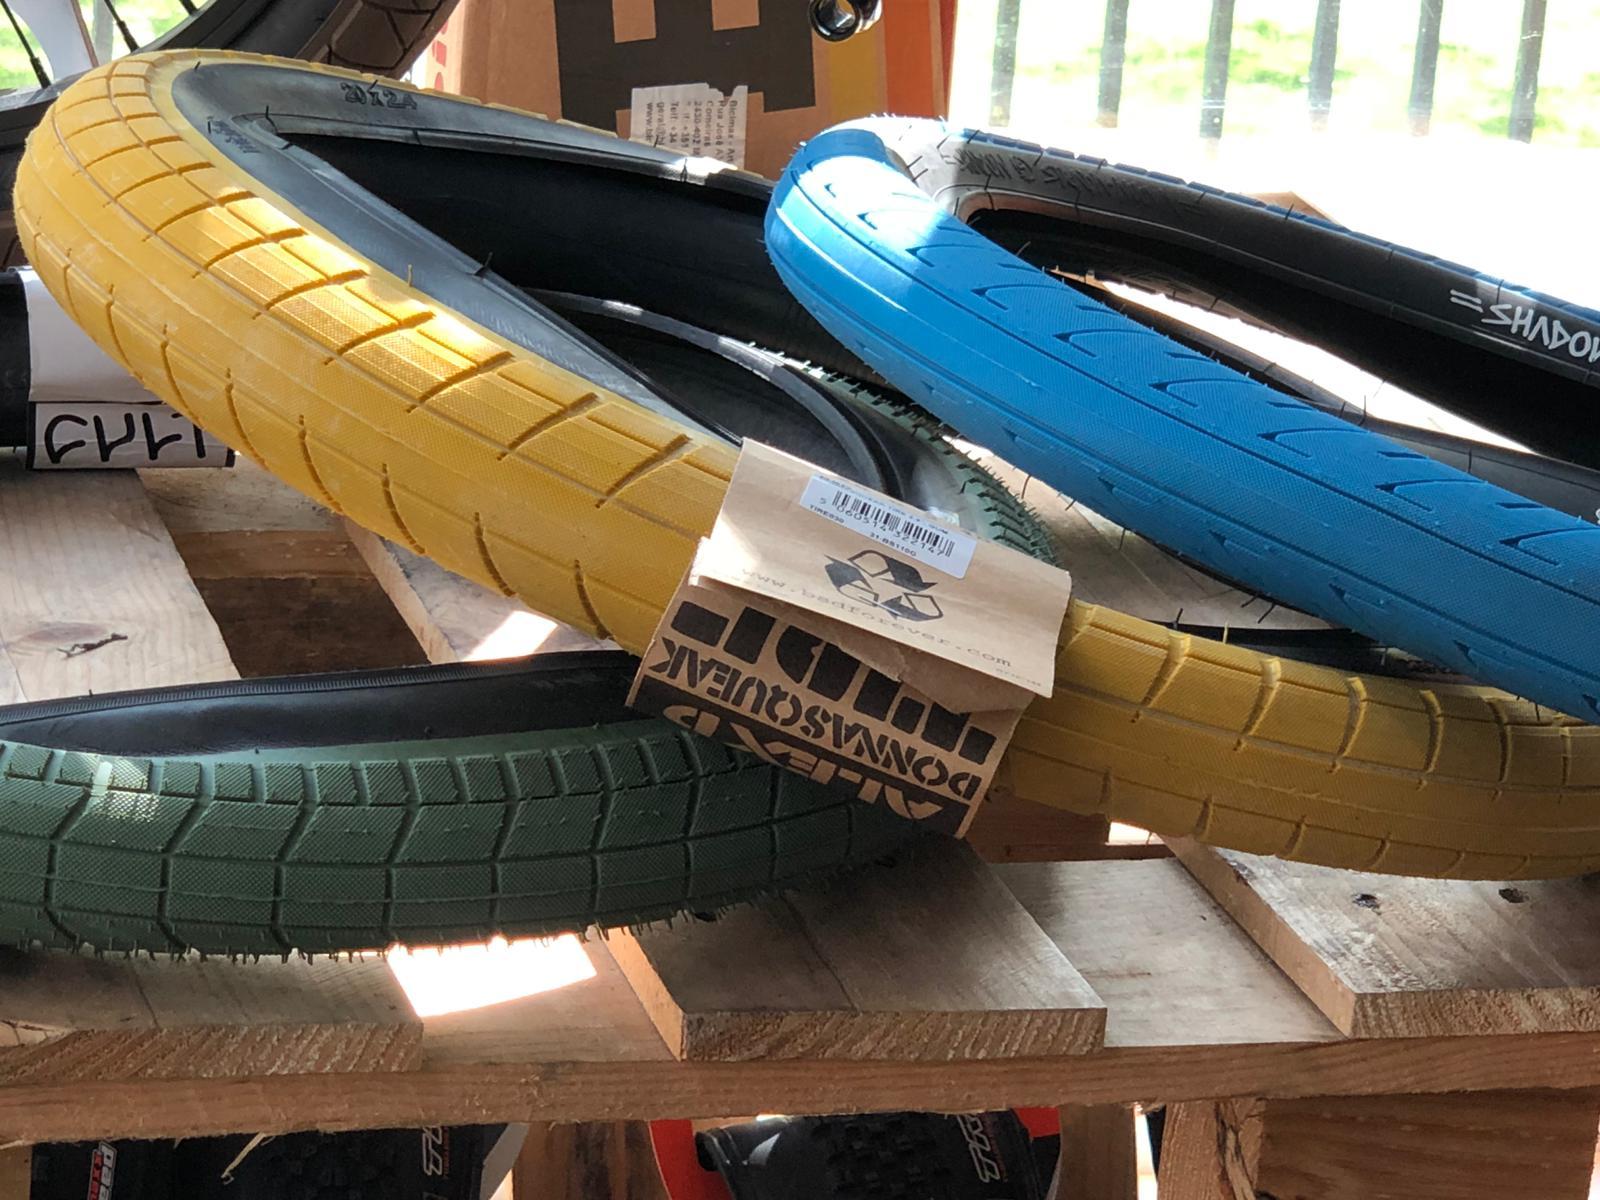 cubiertas y ruedas bmx